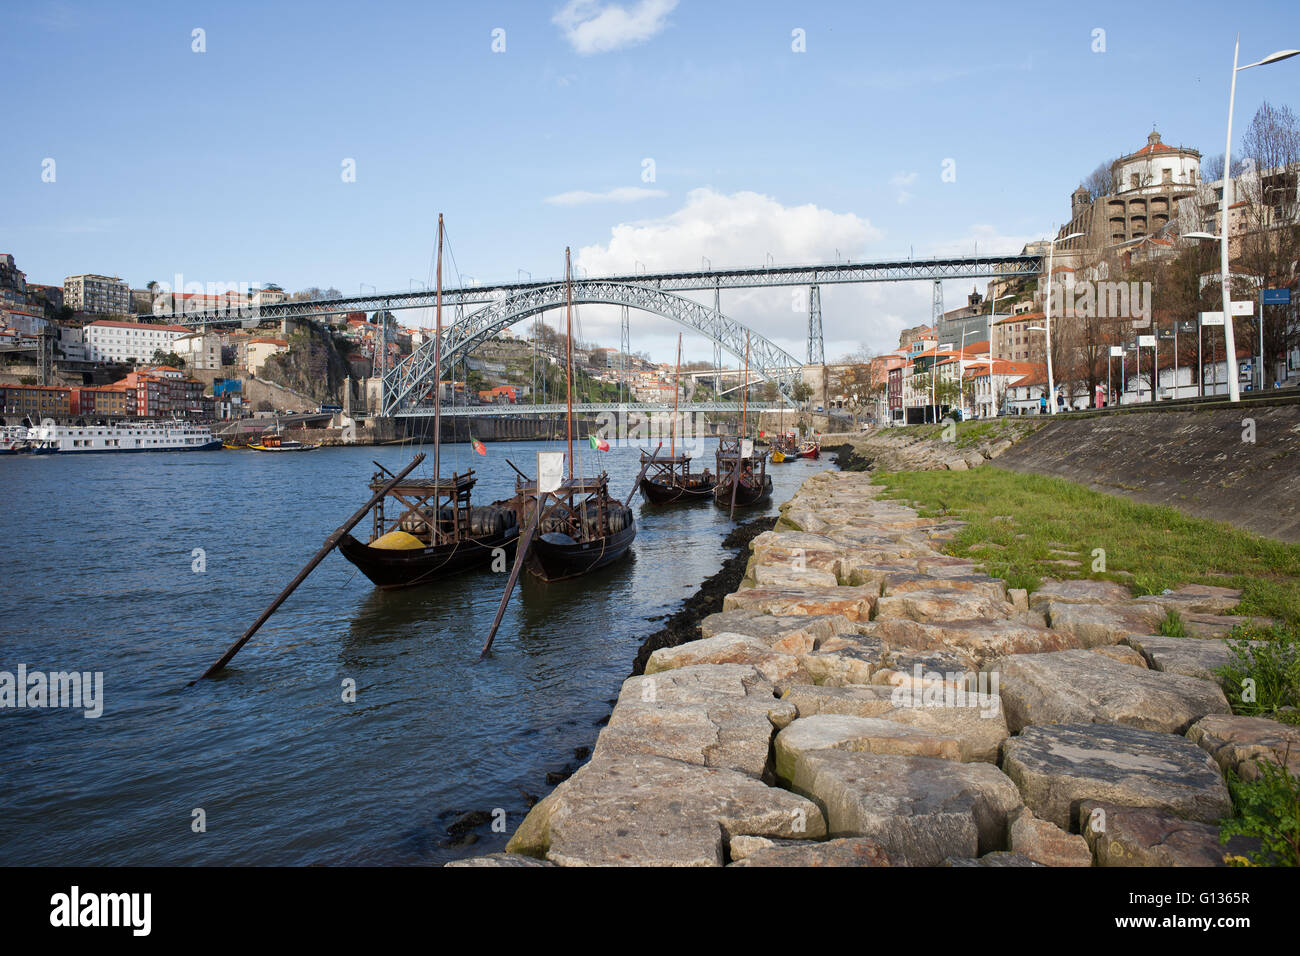 Portugal, city of Porto and Vila Nova de Gaia, Rabelo traditional Portuguese boats for wine transport on Douro river, - Stock Image